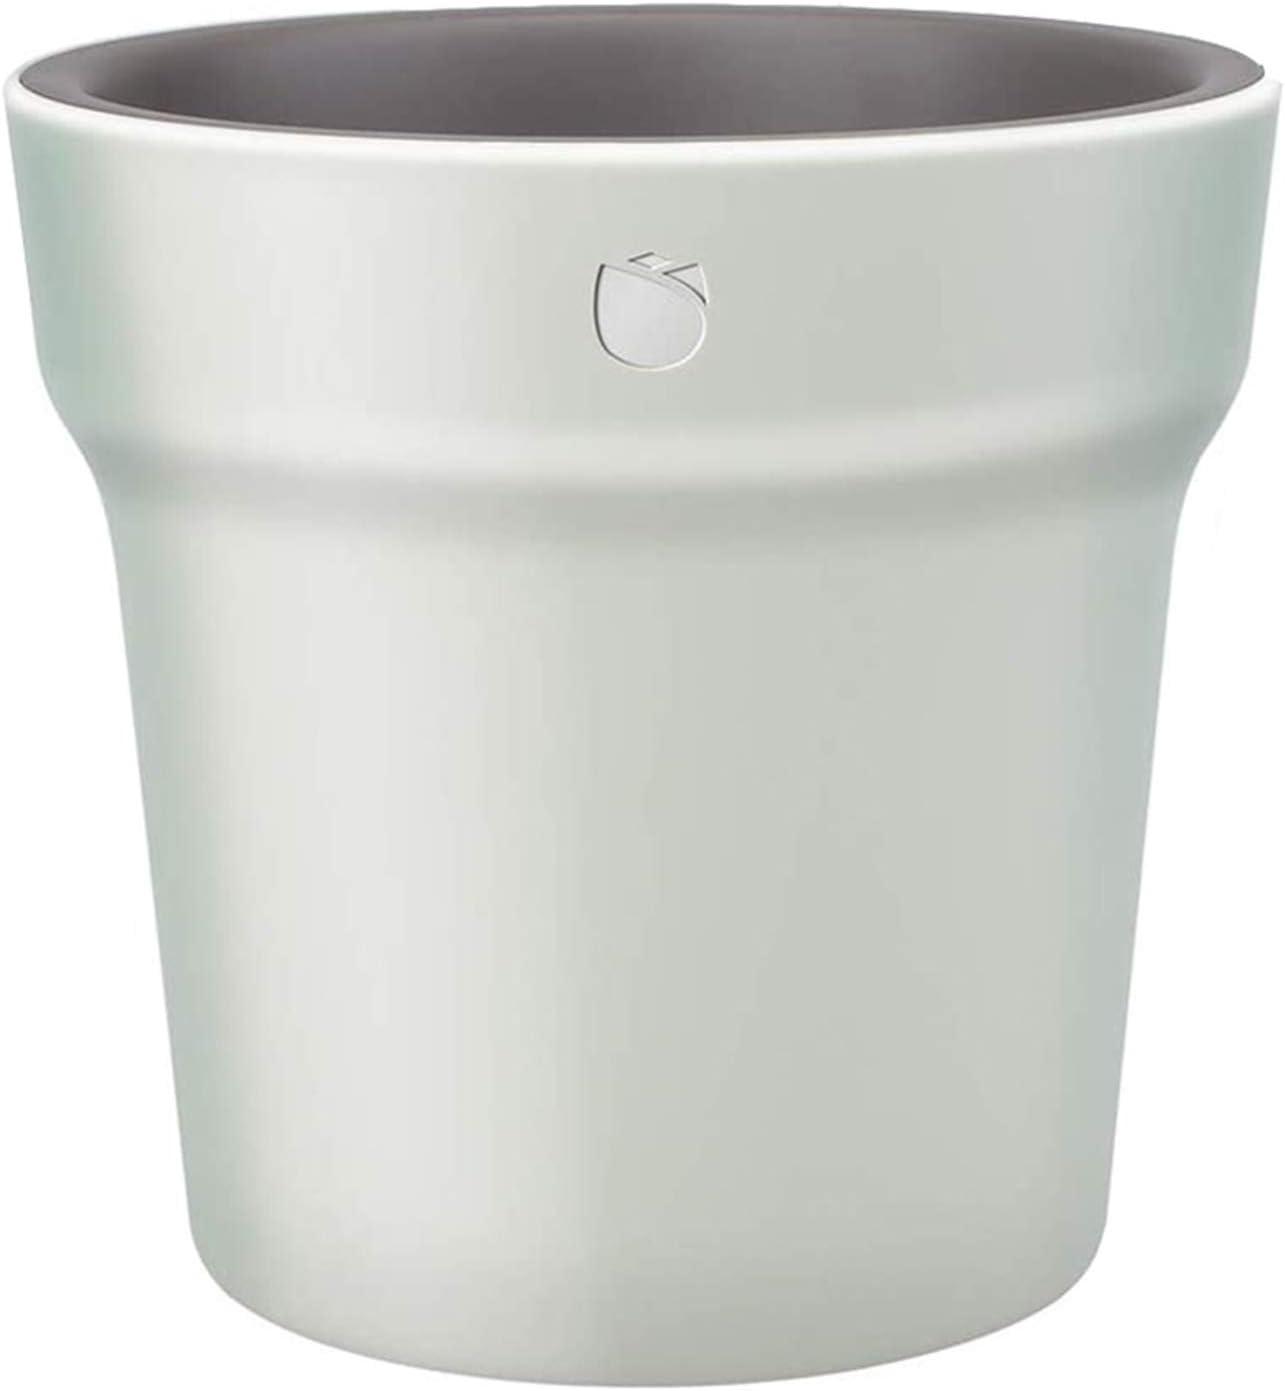 OLLIVAN for HHCC Smart Plant Pots, Indoor Planter with Soil Water Light Tester Moisture Nutrient Detector, Indoor Flower Pots, Plant Monitor Smart Garden Pot for Home Garden Farm-APP Control